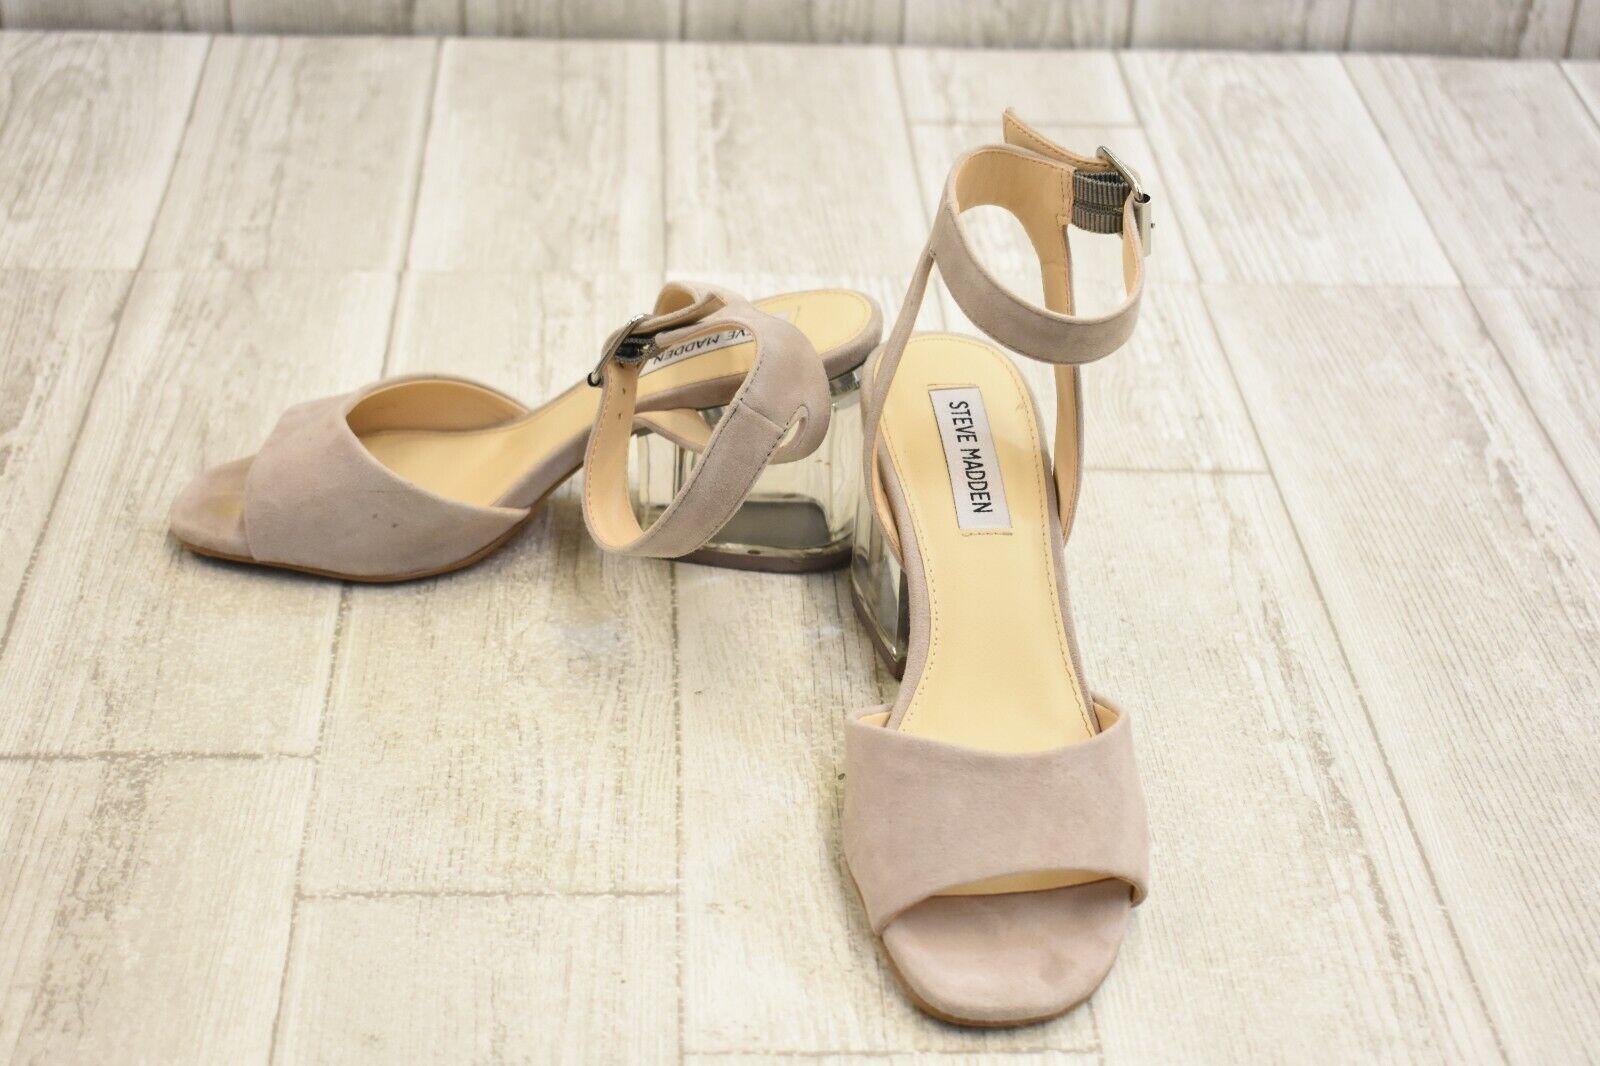 651684127c3 Steve Madden Debbie Heel Sandal - Women's 7M, Grey Size ntrirx860 ...